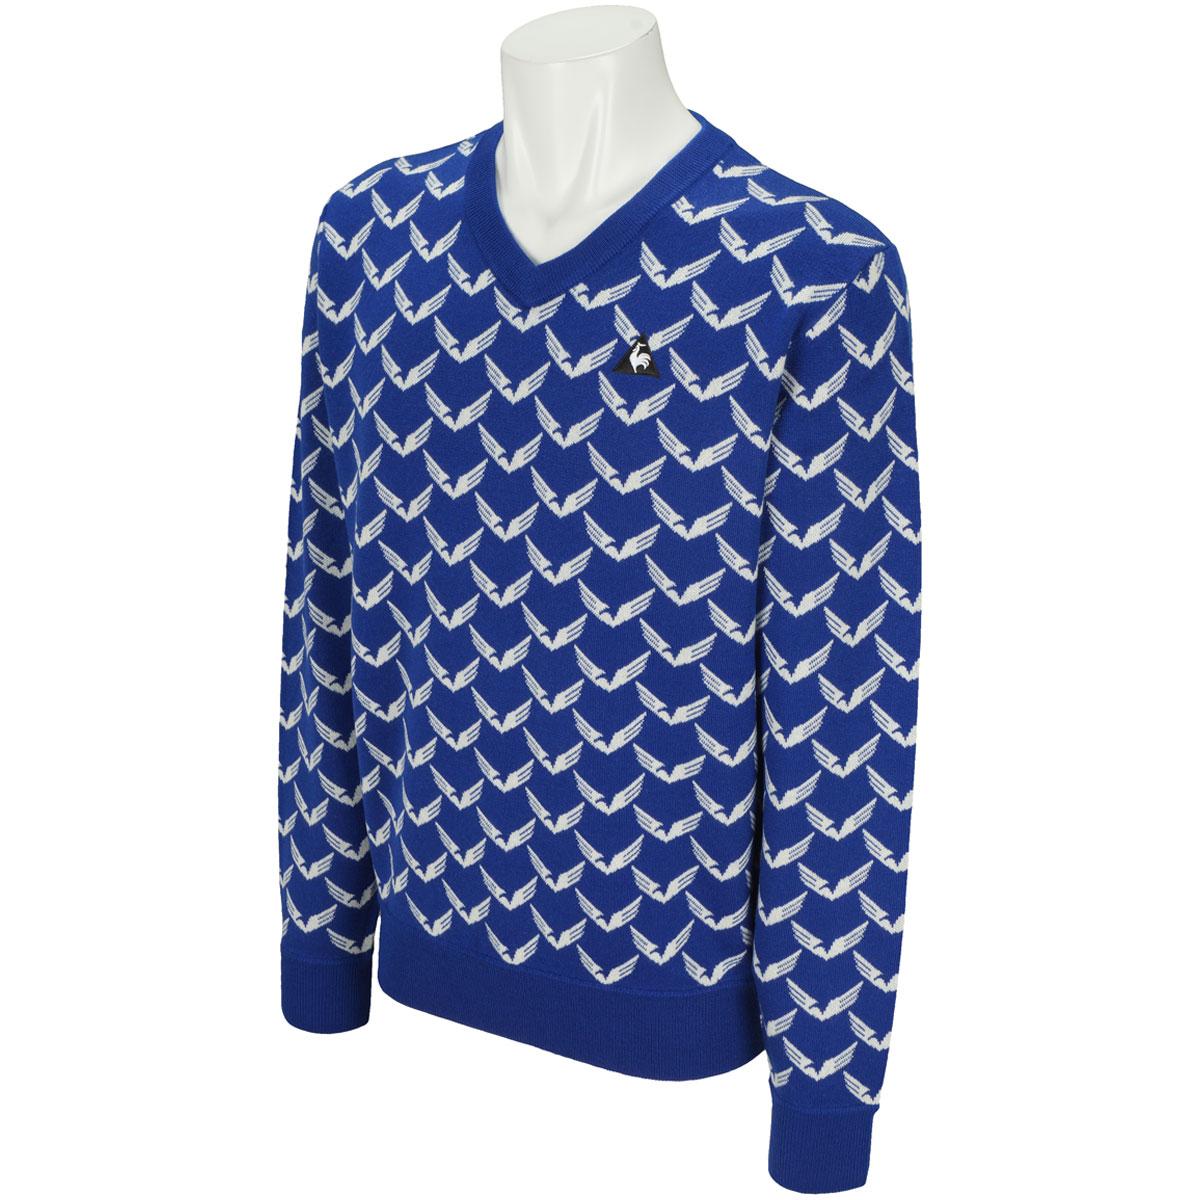 NATURE TECH Vネックセーター